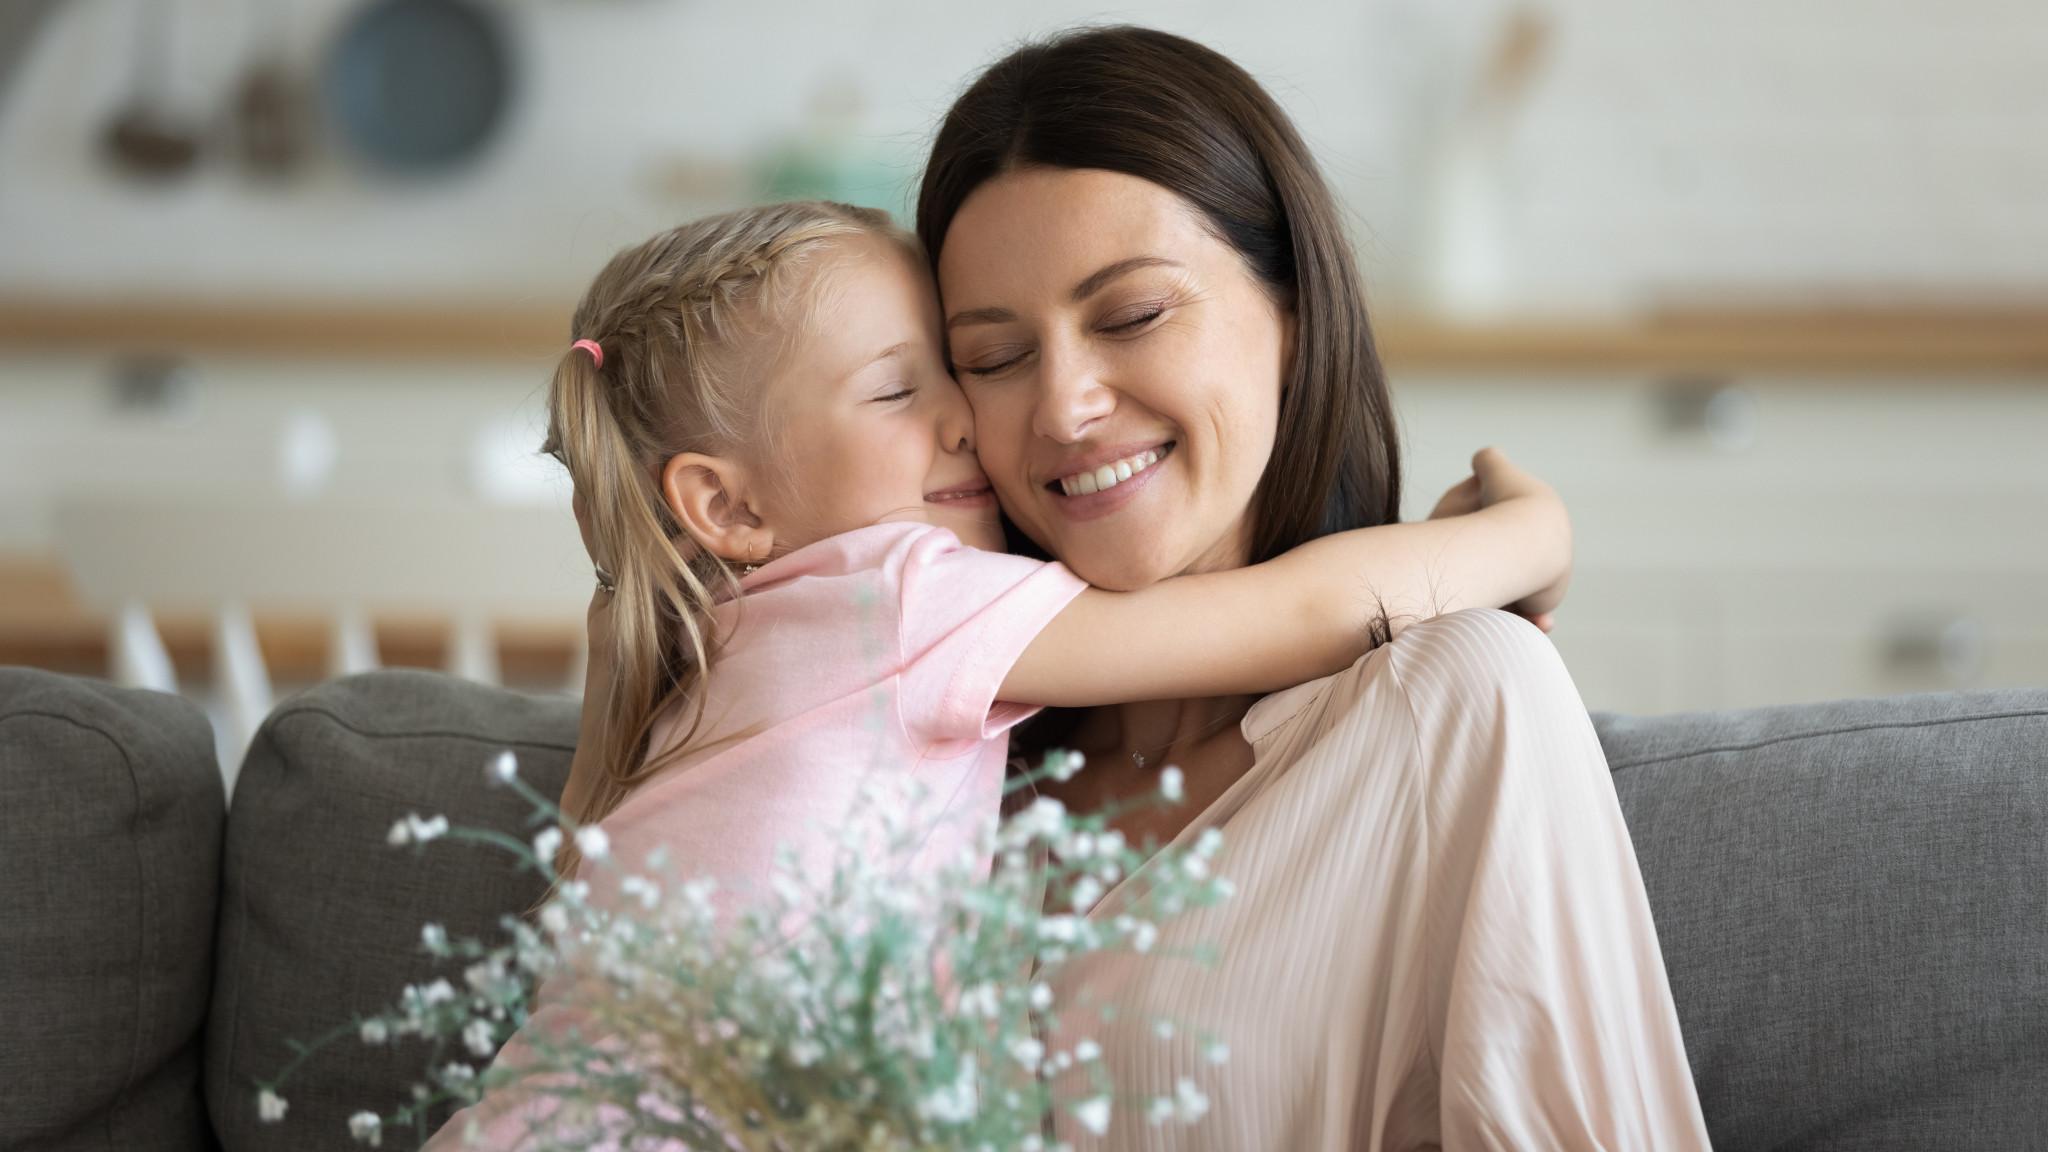 Leendes dotter kramar leendes mamma.